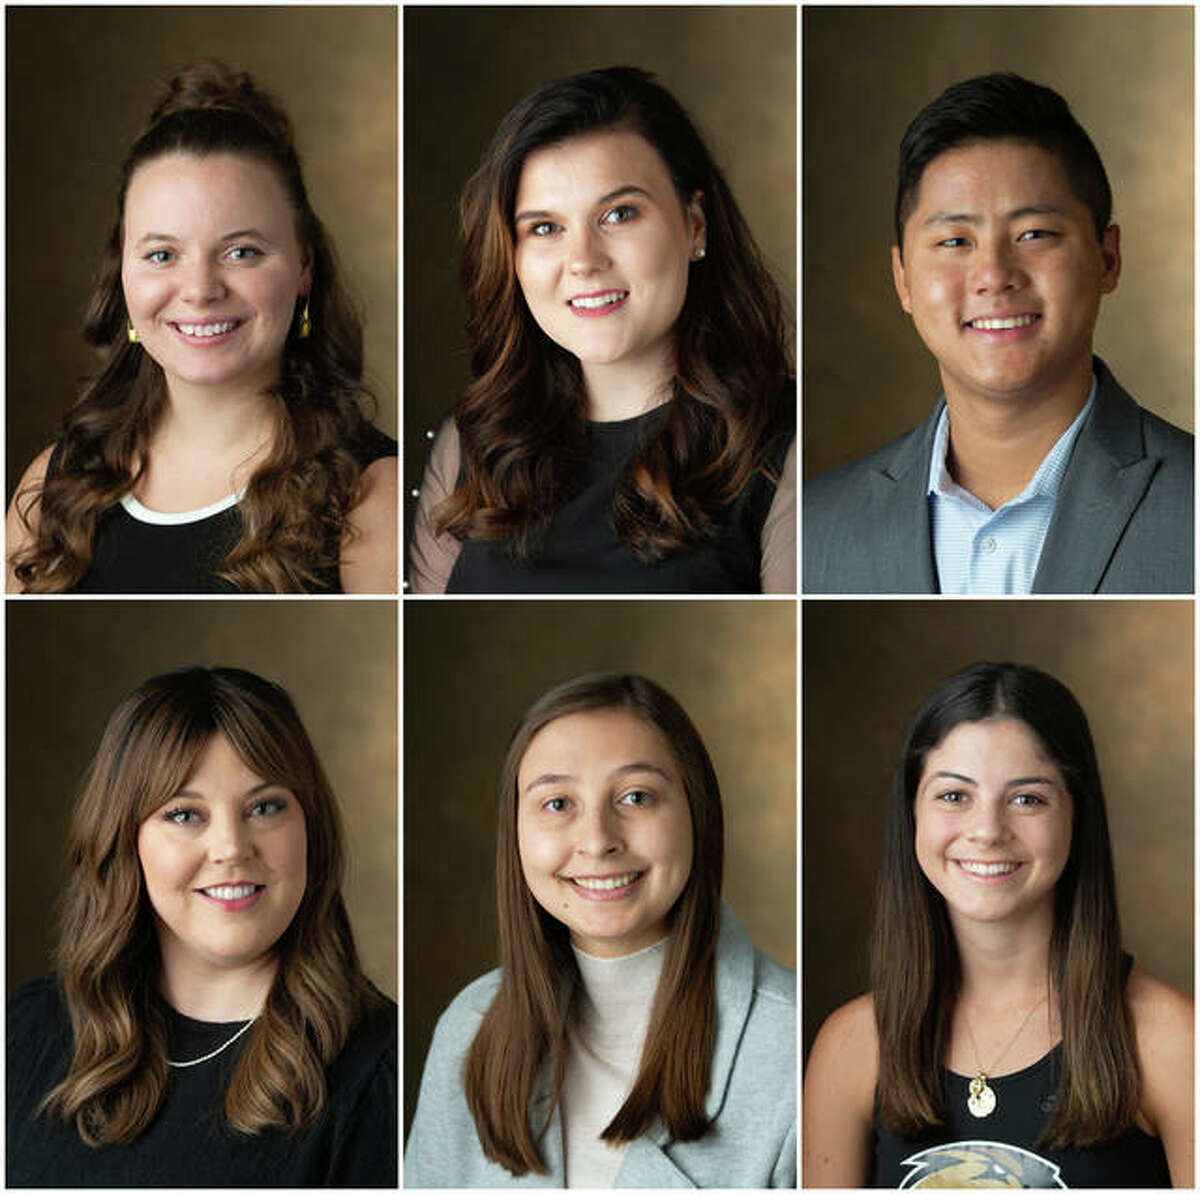 Photo (L-R): Top Row - Cassidy Bruns, Paulina Fuhrmann and Matthew Gregor. Bottom Row - Caitlin Phelan, Ashley Spain and Laura Tupper.